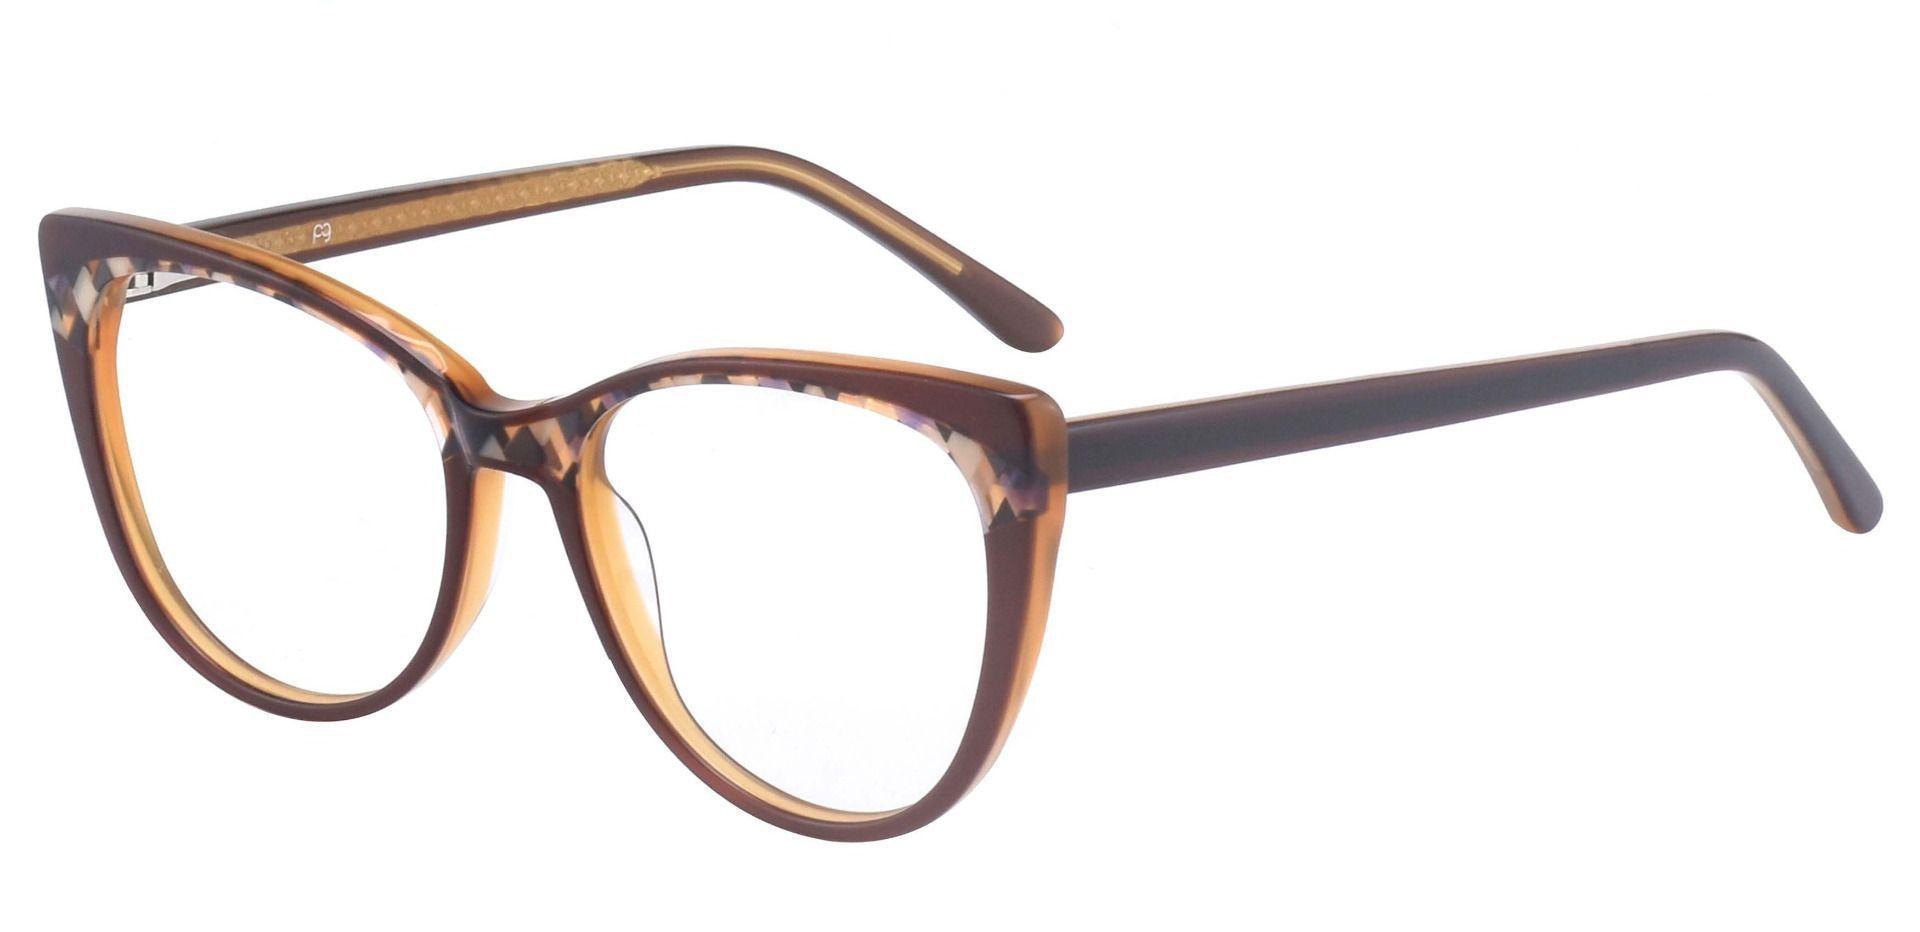 Cabernet Cat Eye Prescription Glasses - Brown